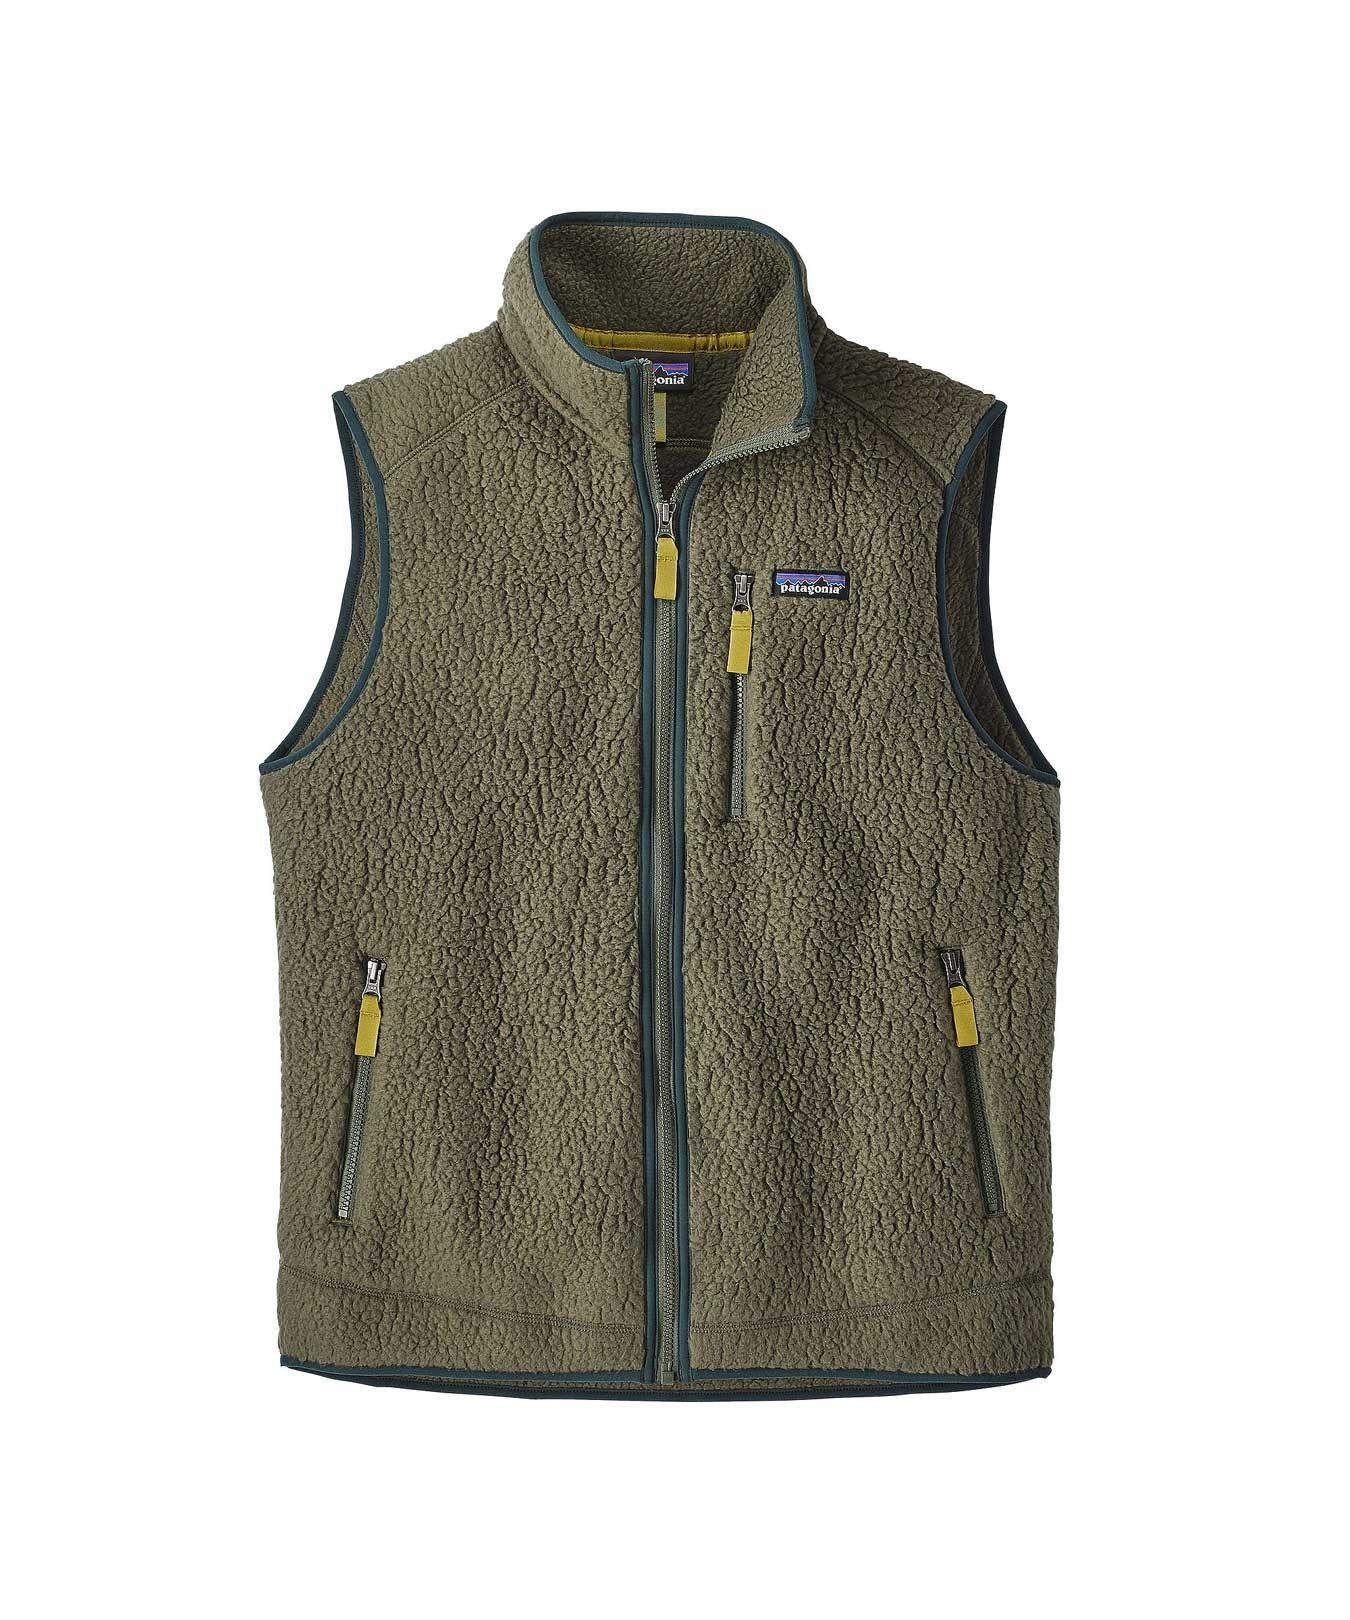 Patagonia at Weavers Door | AW17 | Patagonia | Jackets | Retro Pile Fleece Vest |  sc 1 st  Pinterest & Patagonia at Weavers Door | AW17 | Patagonia | Jackets | Retro Pile ...